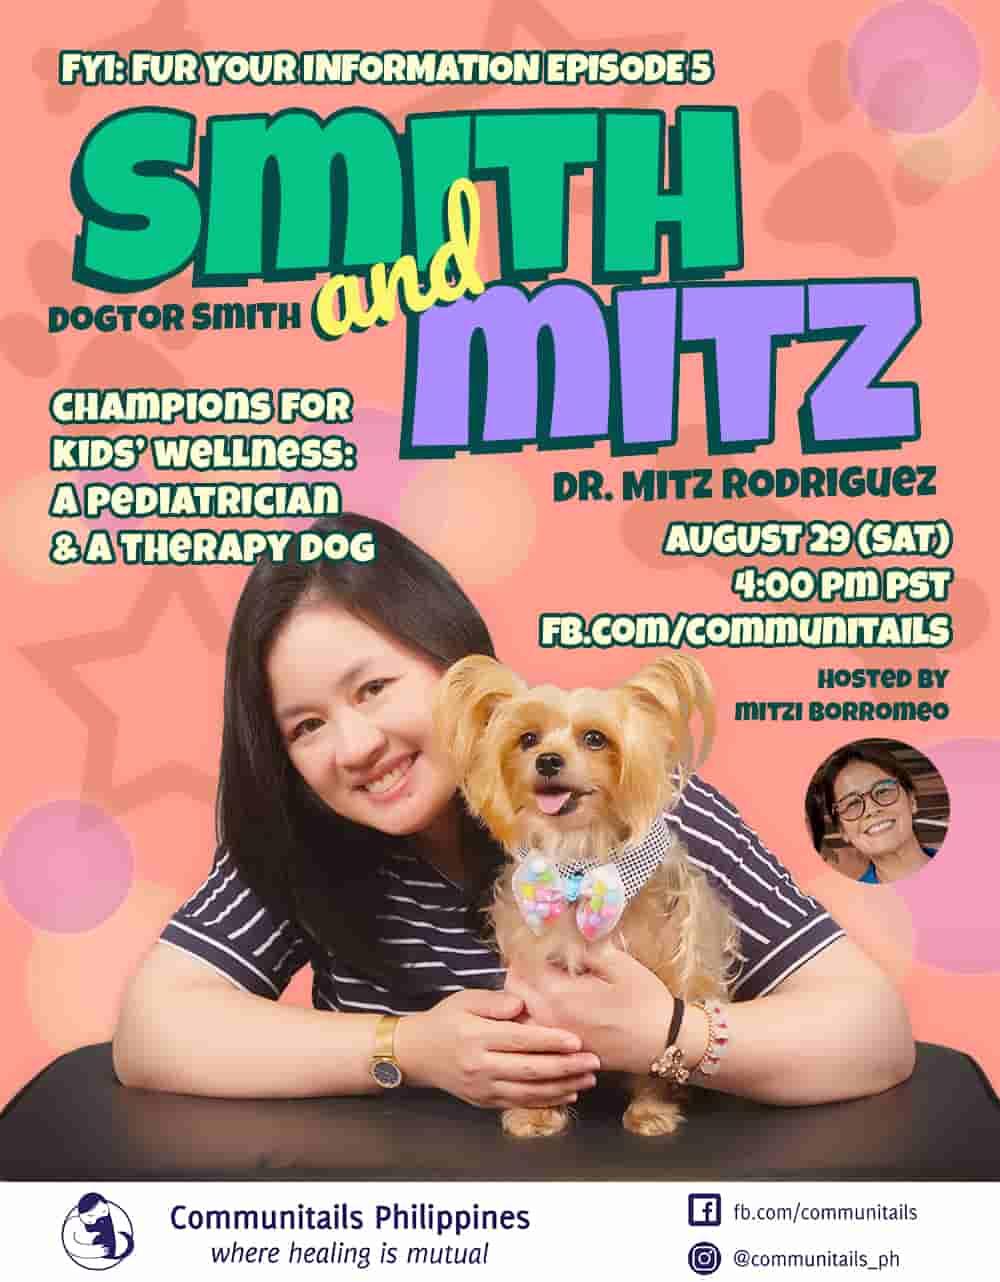 Fur Your Information (FYI) Episode 5: Dogtor Smith & Dr. Mizzi